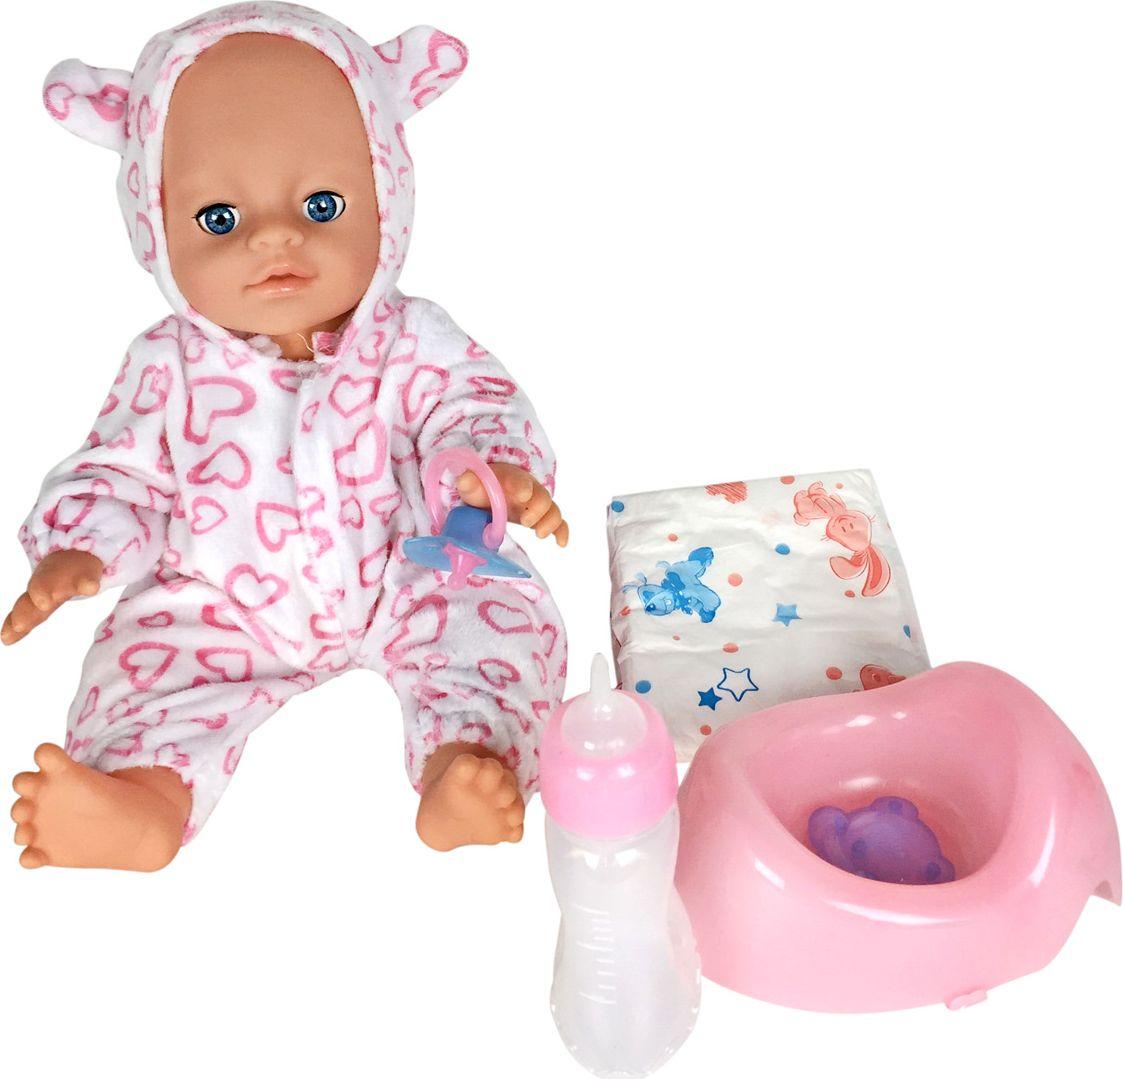 Lisa Jane Пупс с горшком 35 см 59465 кукла интерактивная lisa jane mami в розовом 40 см